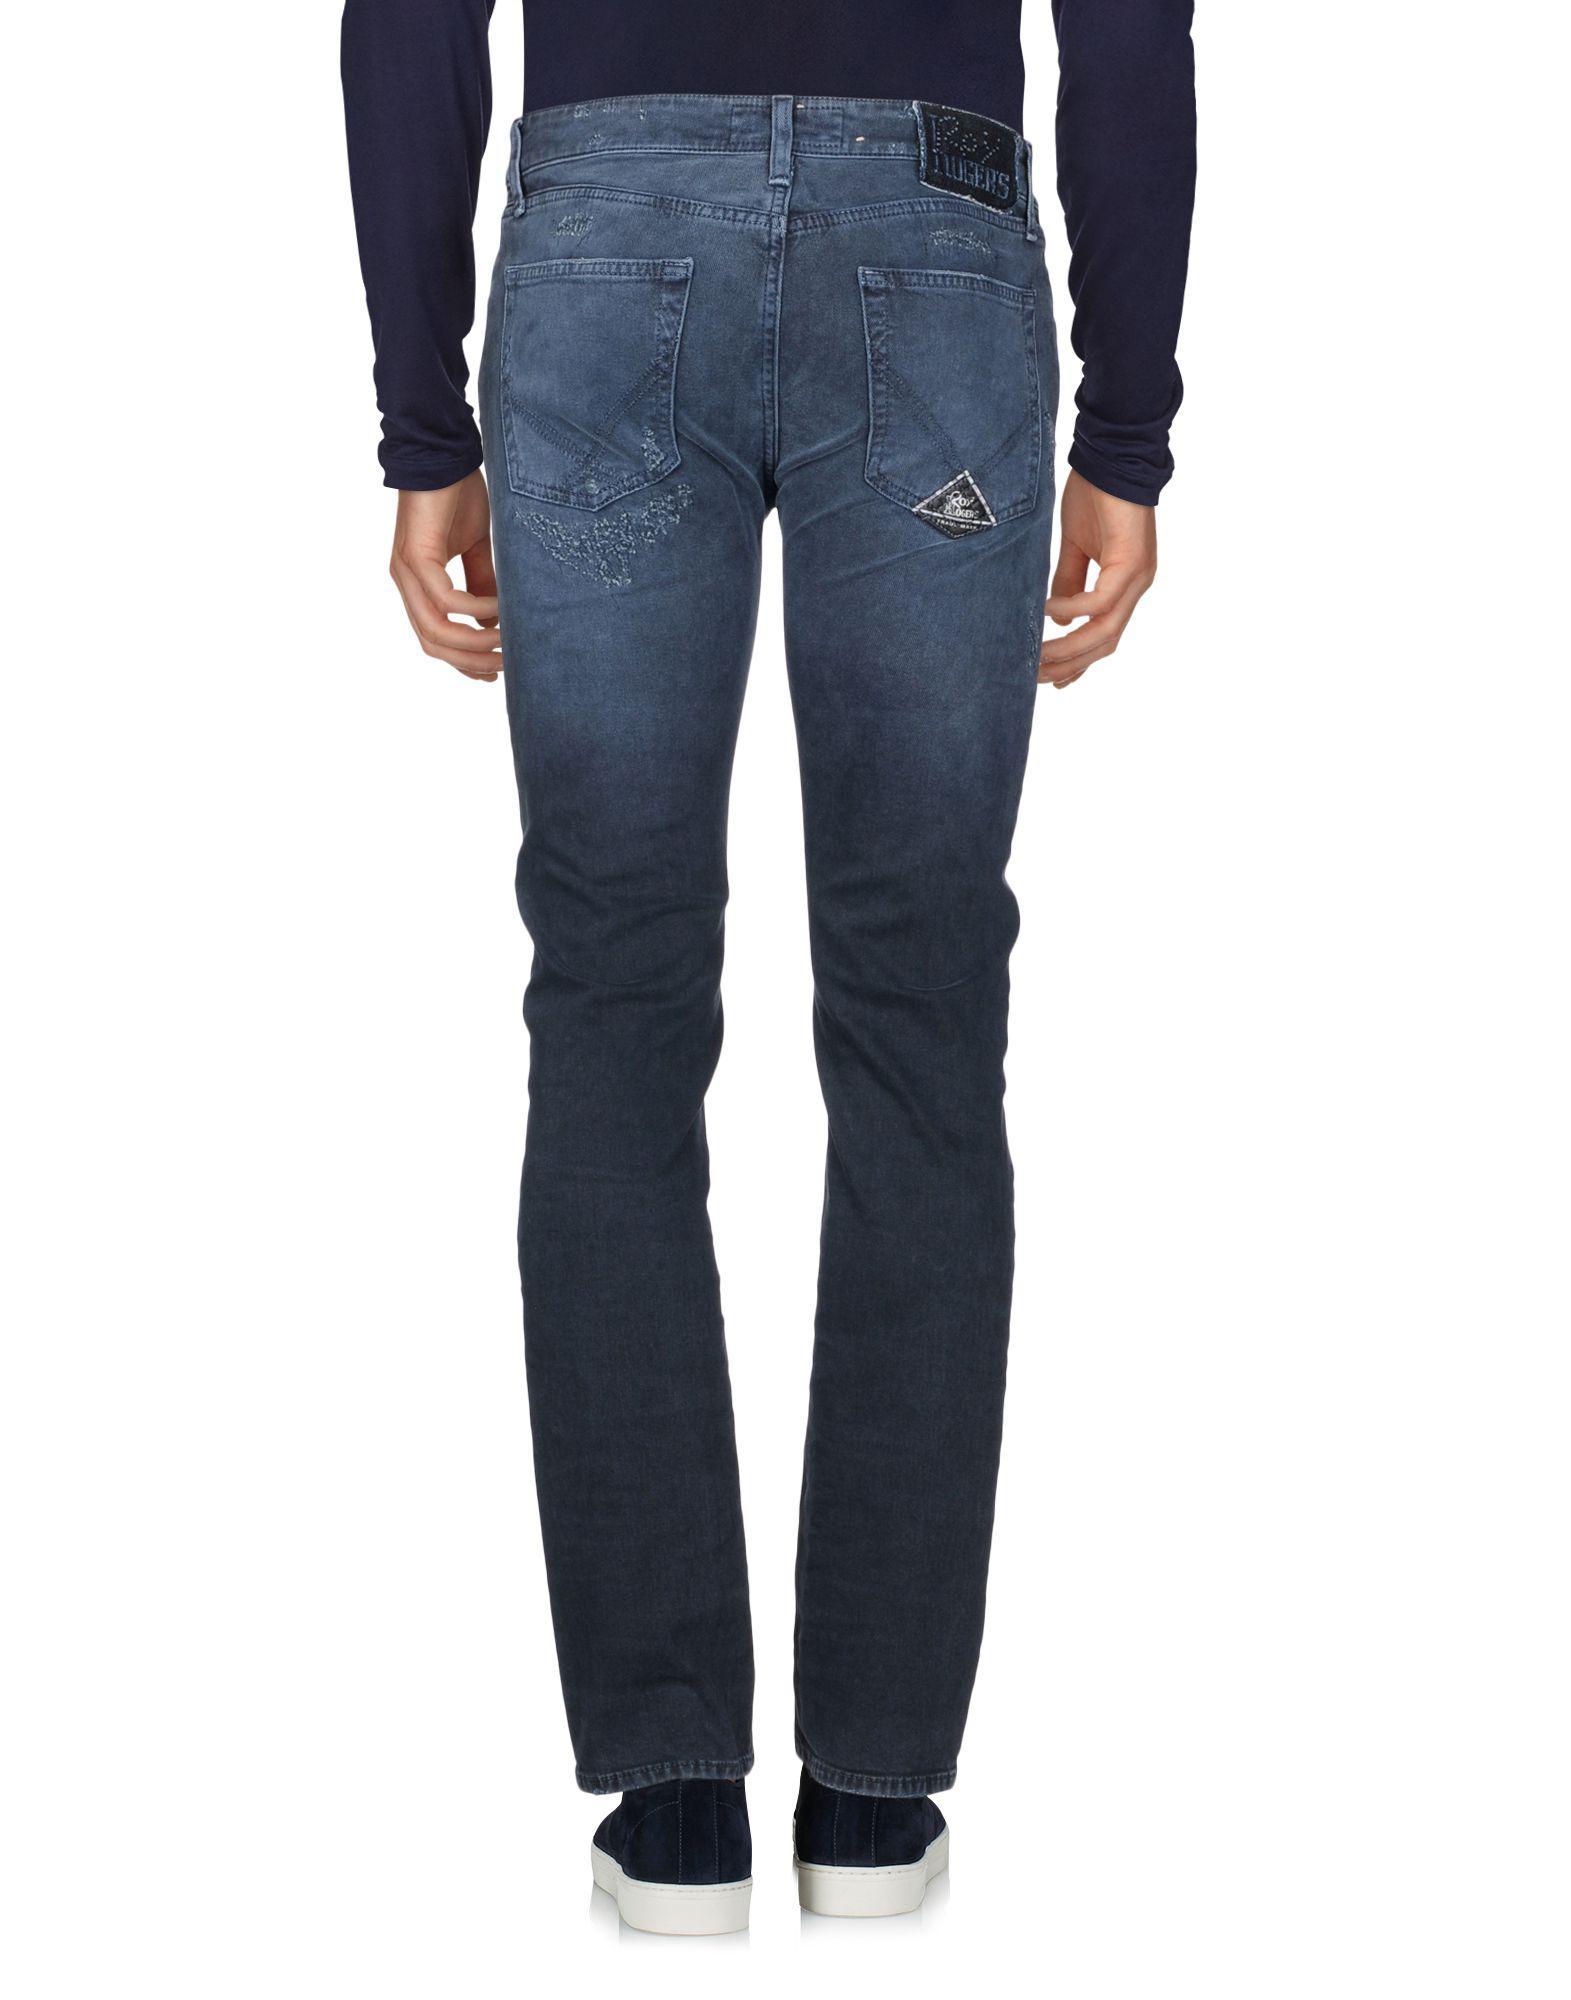 Roy Rogers Denim Trousers in Slate Blue (Blue) for Men